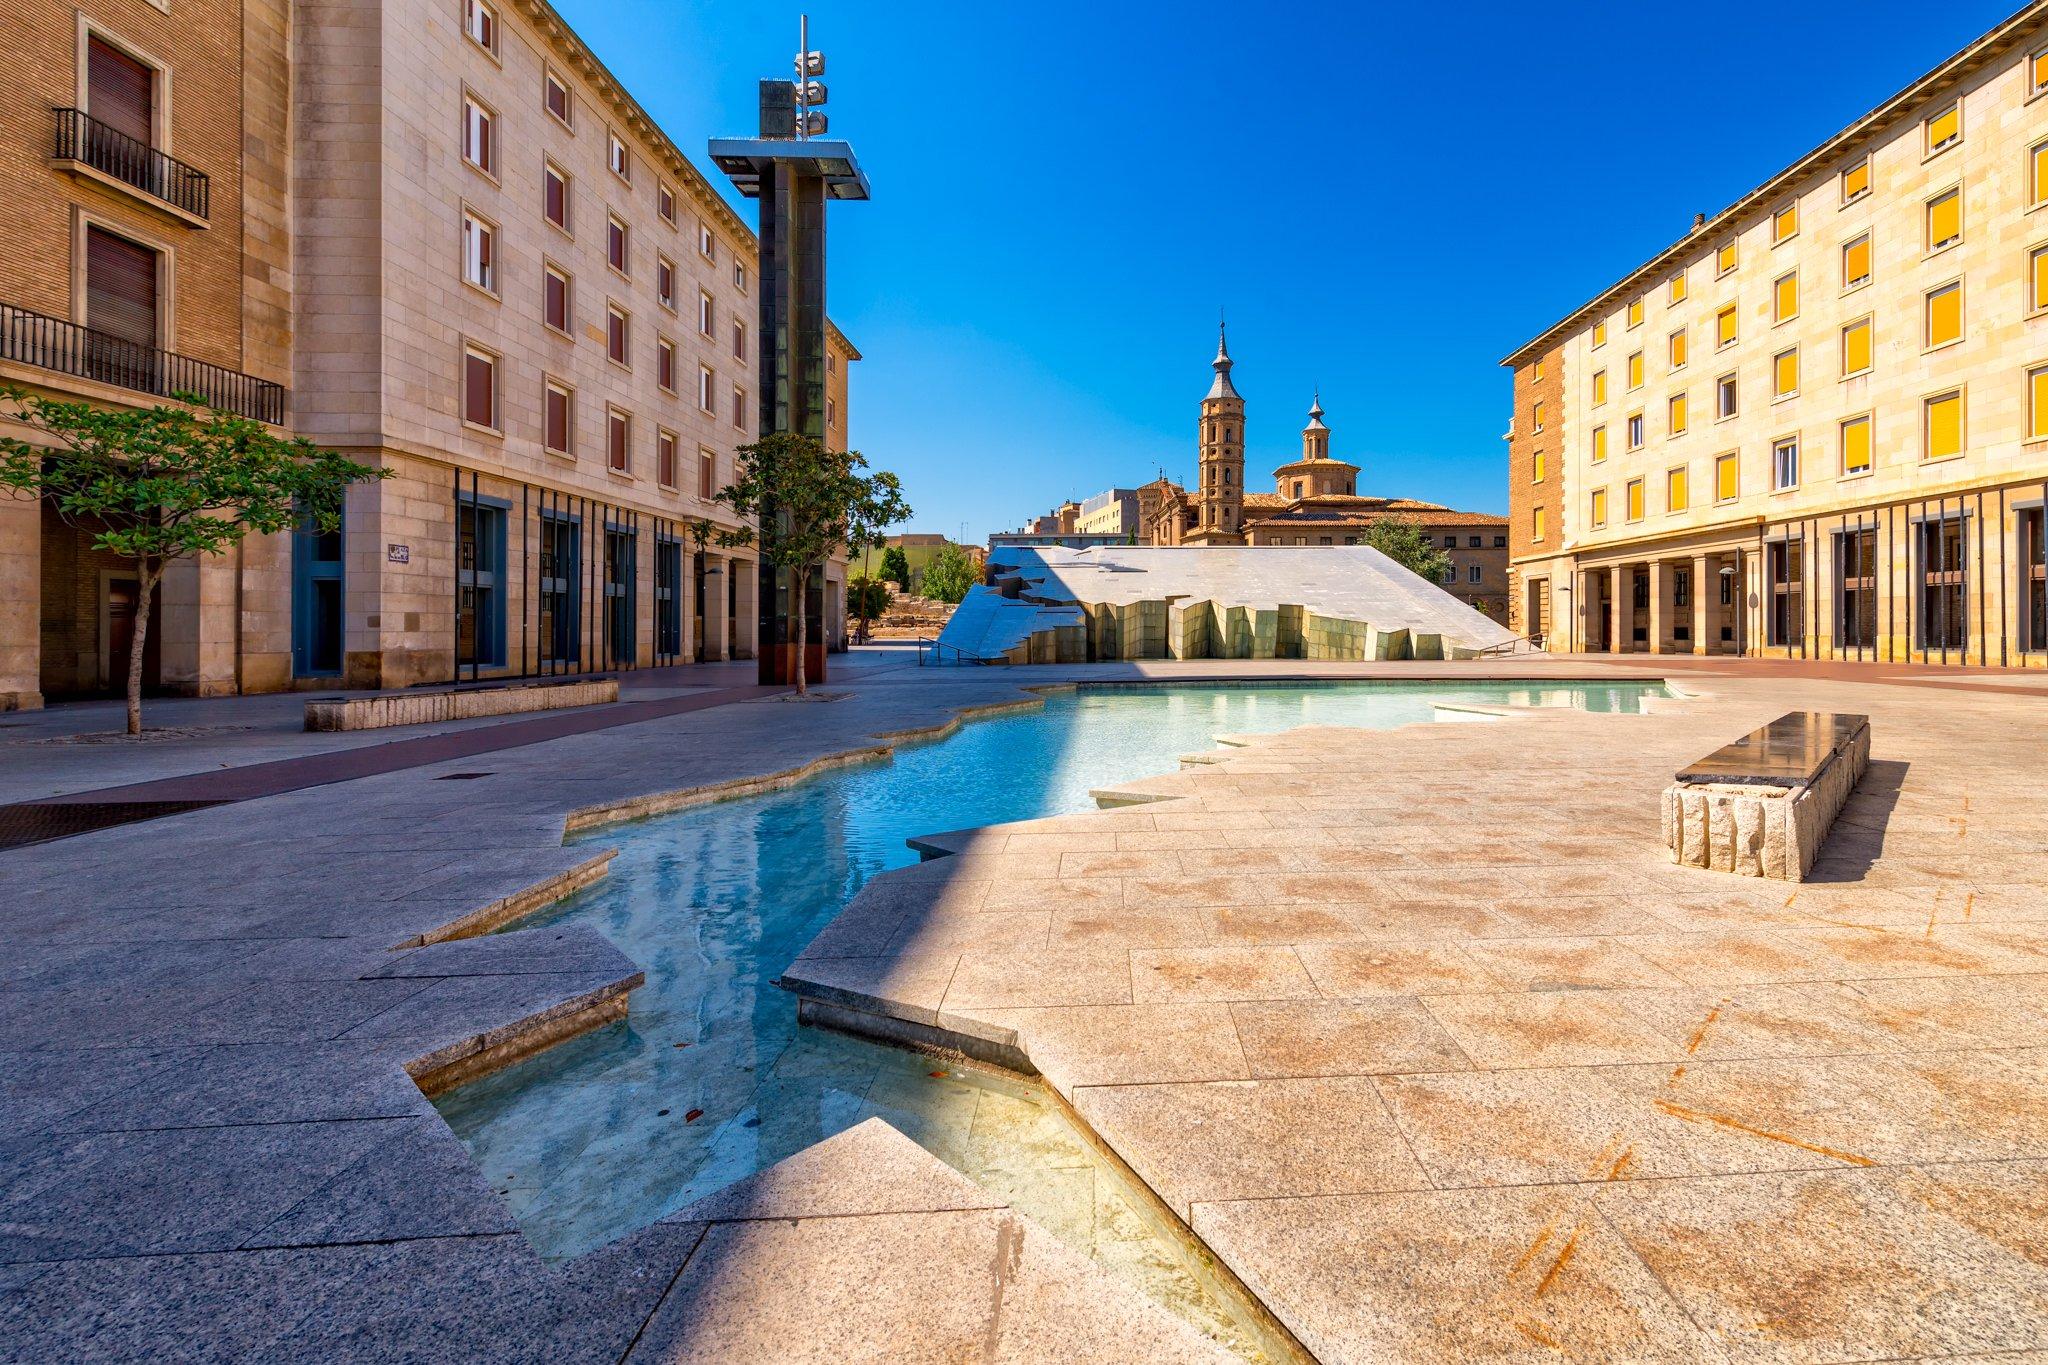 The Fuente de la Hispanidad fountain in Zaragoza, depicting South and Central America.